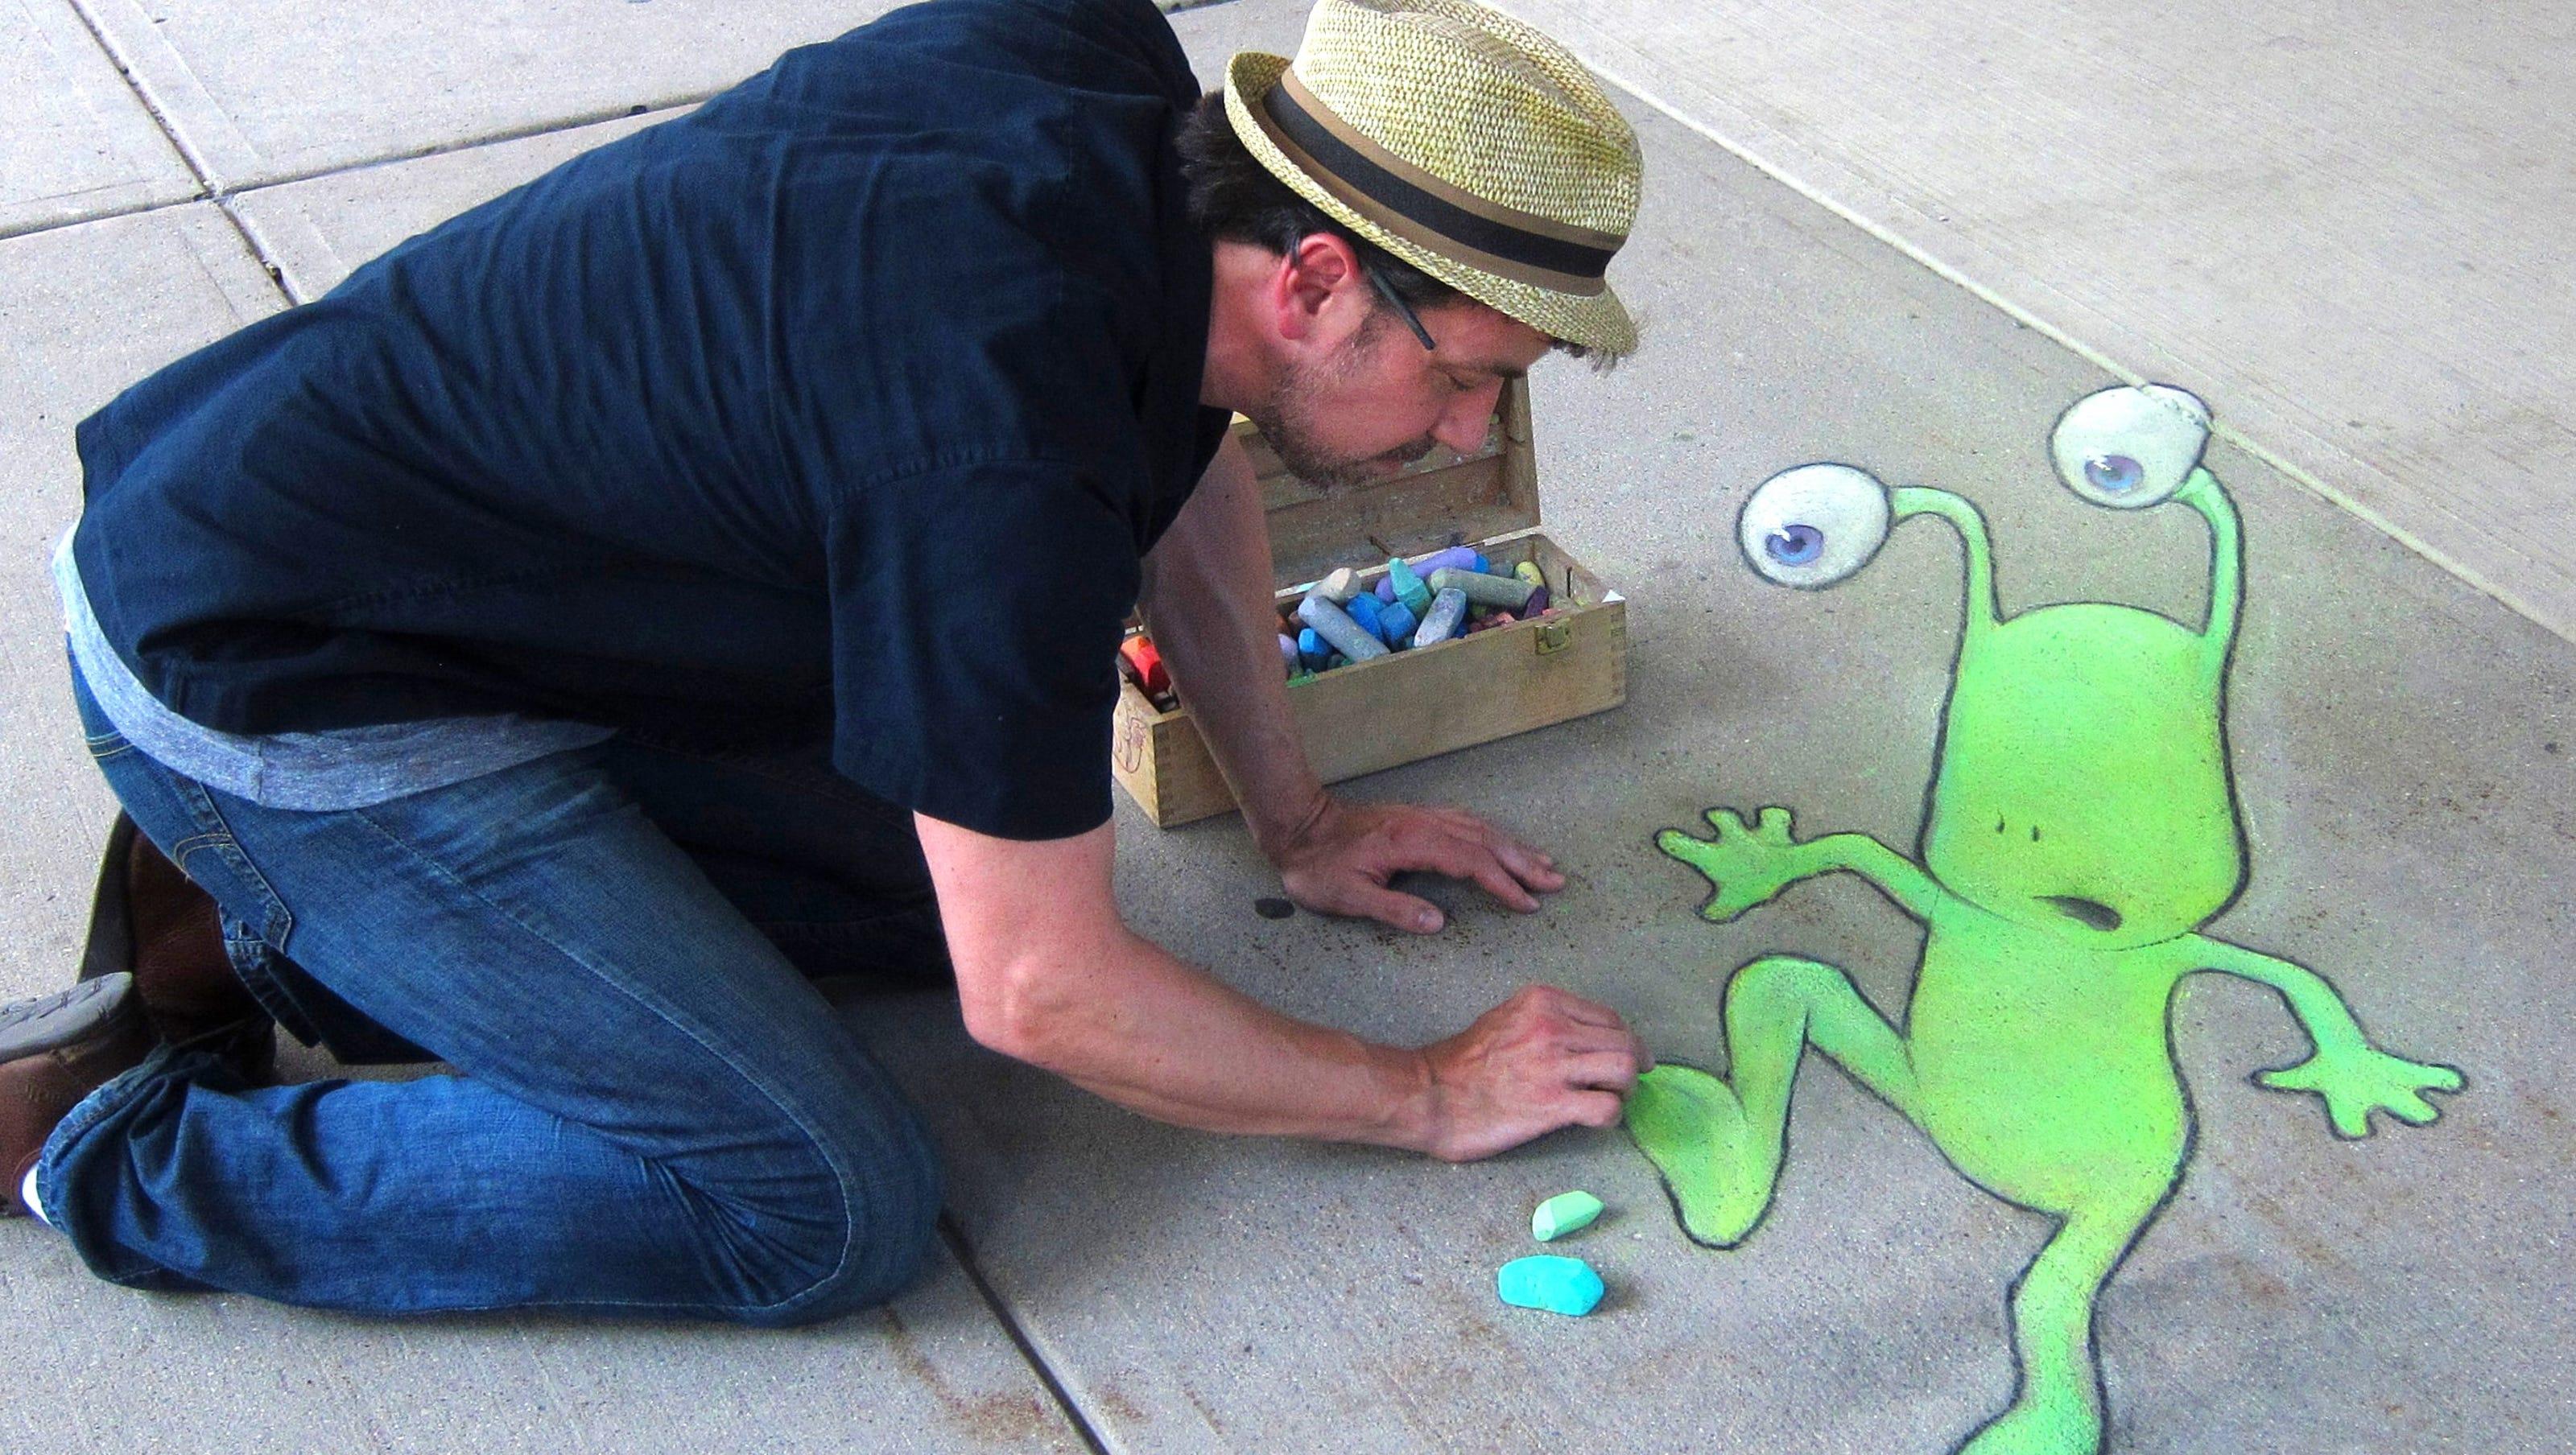 3D chalk artist wants community to help create 'masterpiece' in Hyne Alley in Brighton